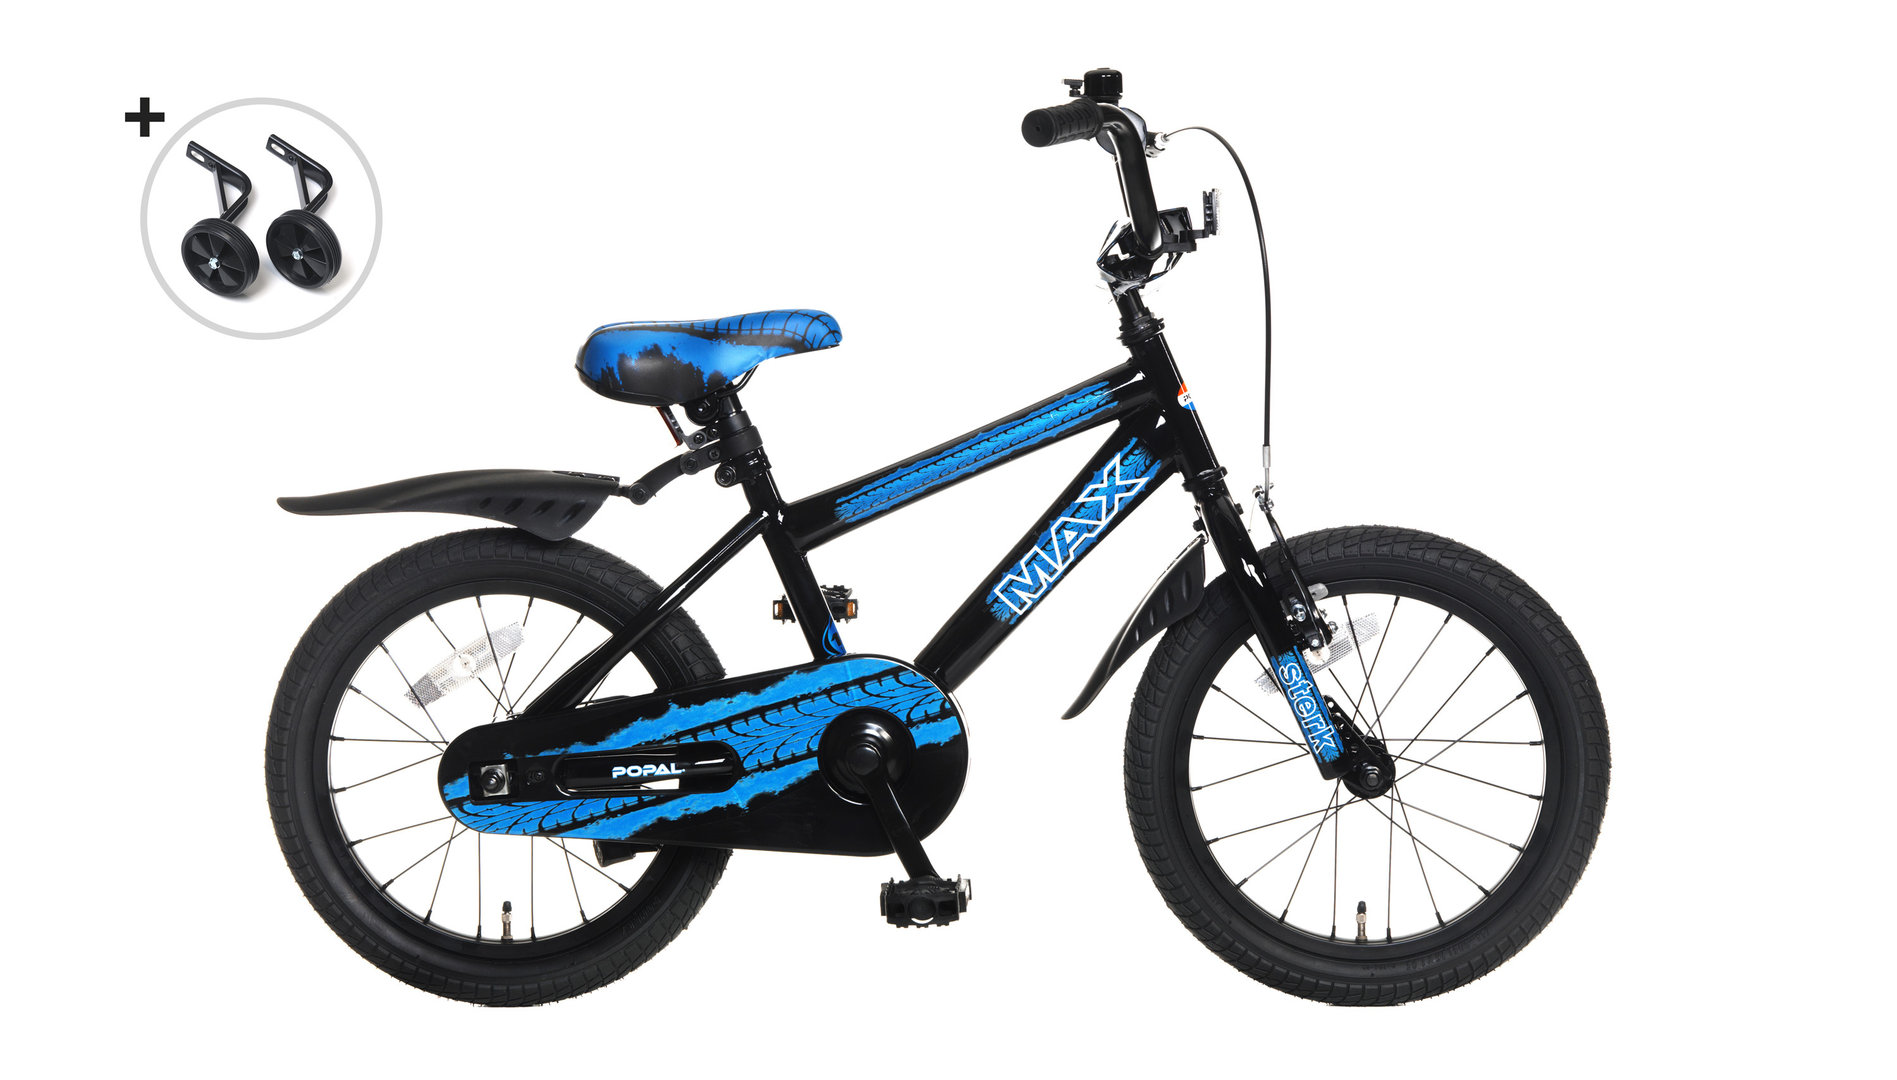 16 Zoll Kinderfahrrad Max schwarz-blau - fahrrad-Ass de